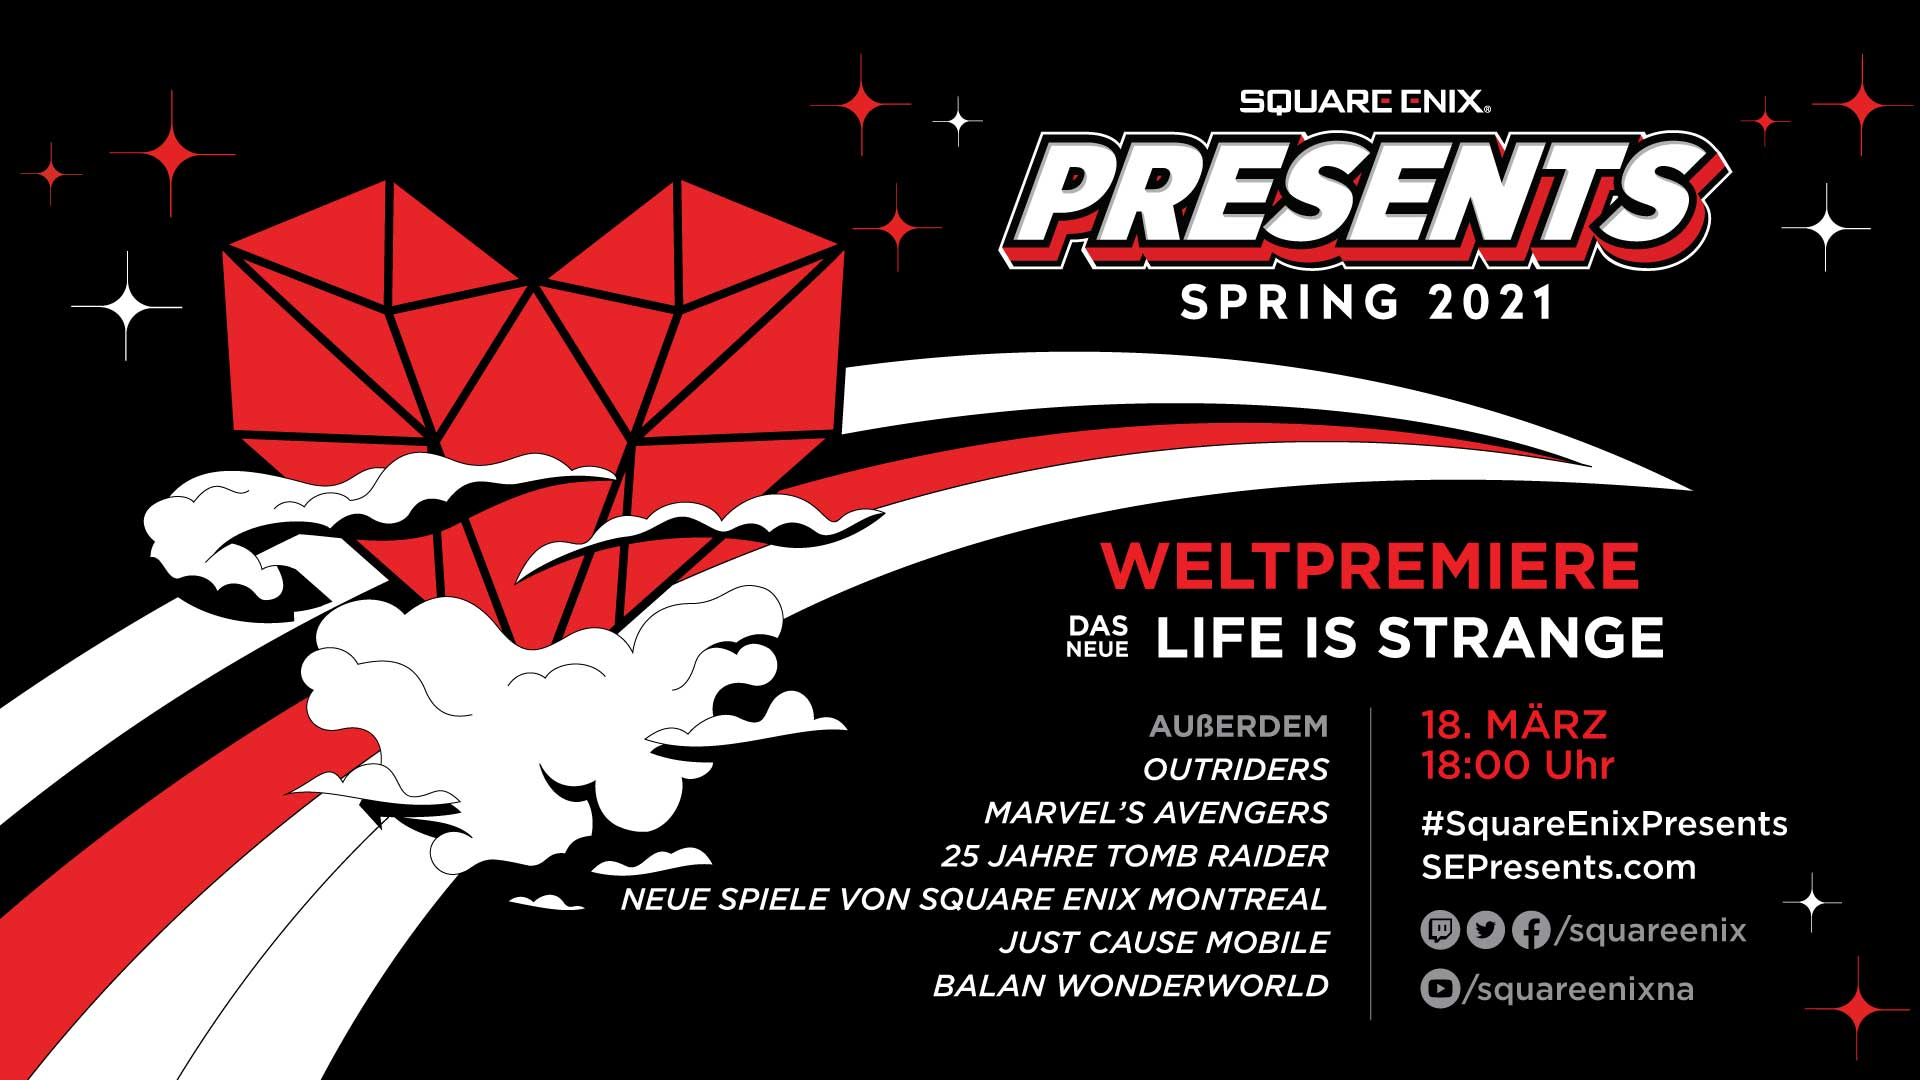 Square Enix Presents Debüt Ankündigung